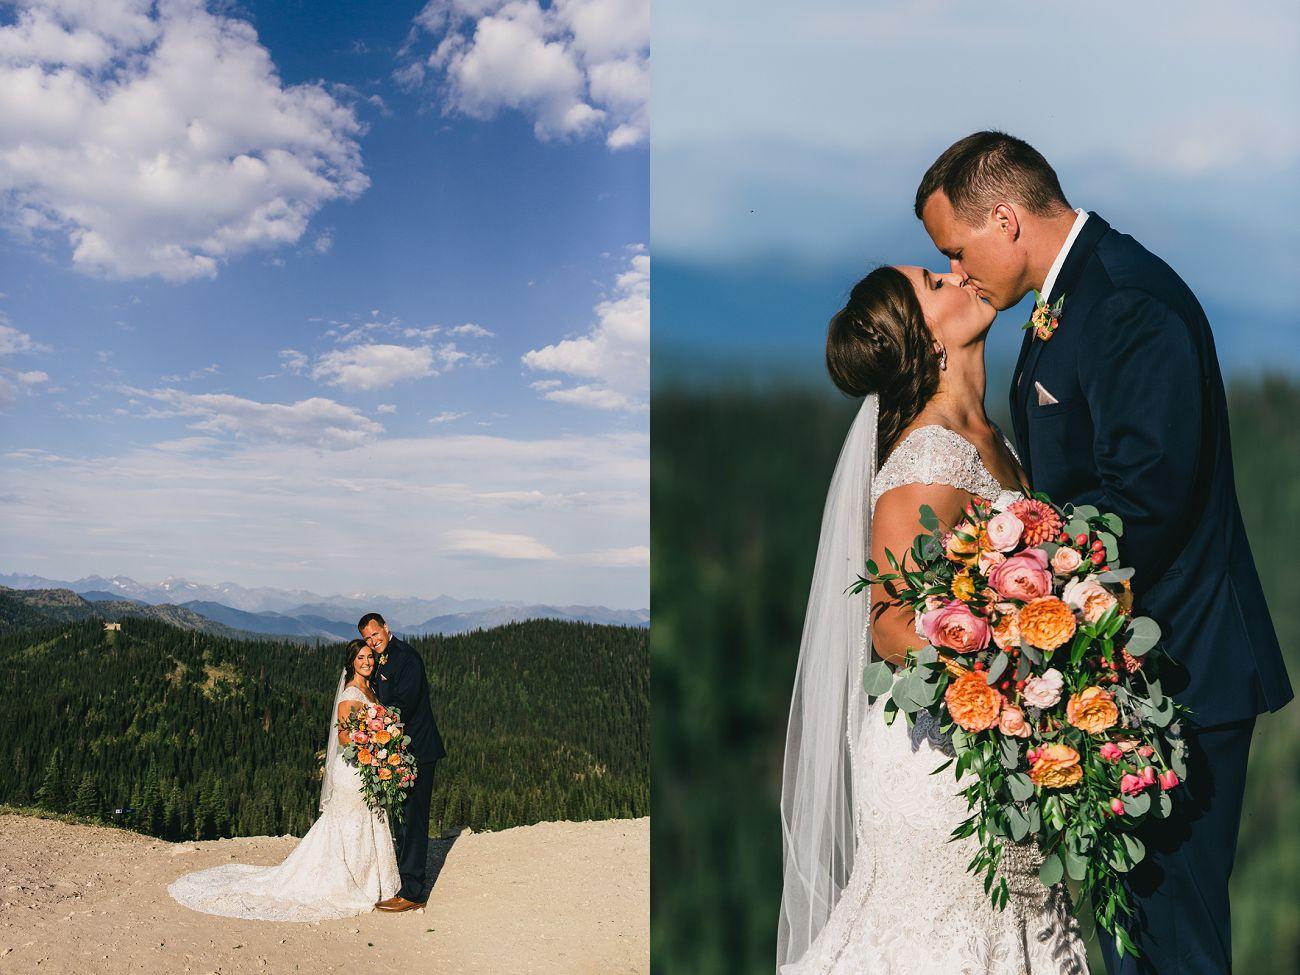 Jennifer_Mooney_Photo_Whitefish_Mountain_Resort_Wedding_00084.jpg